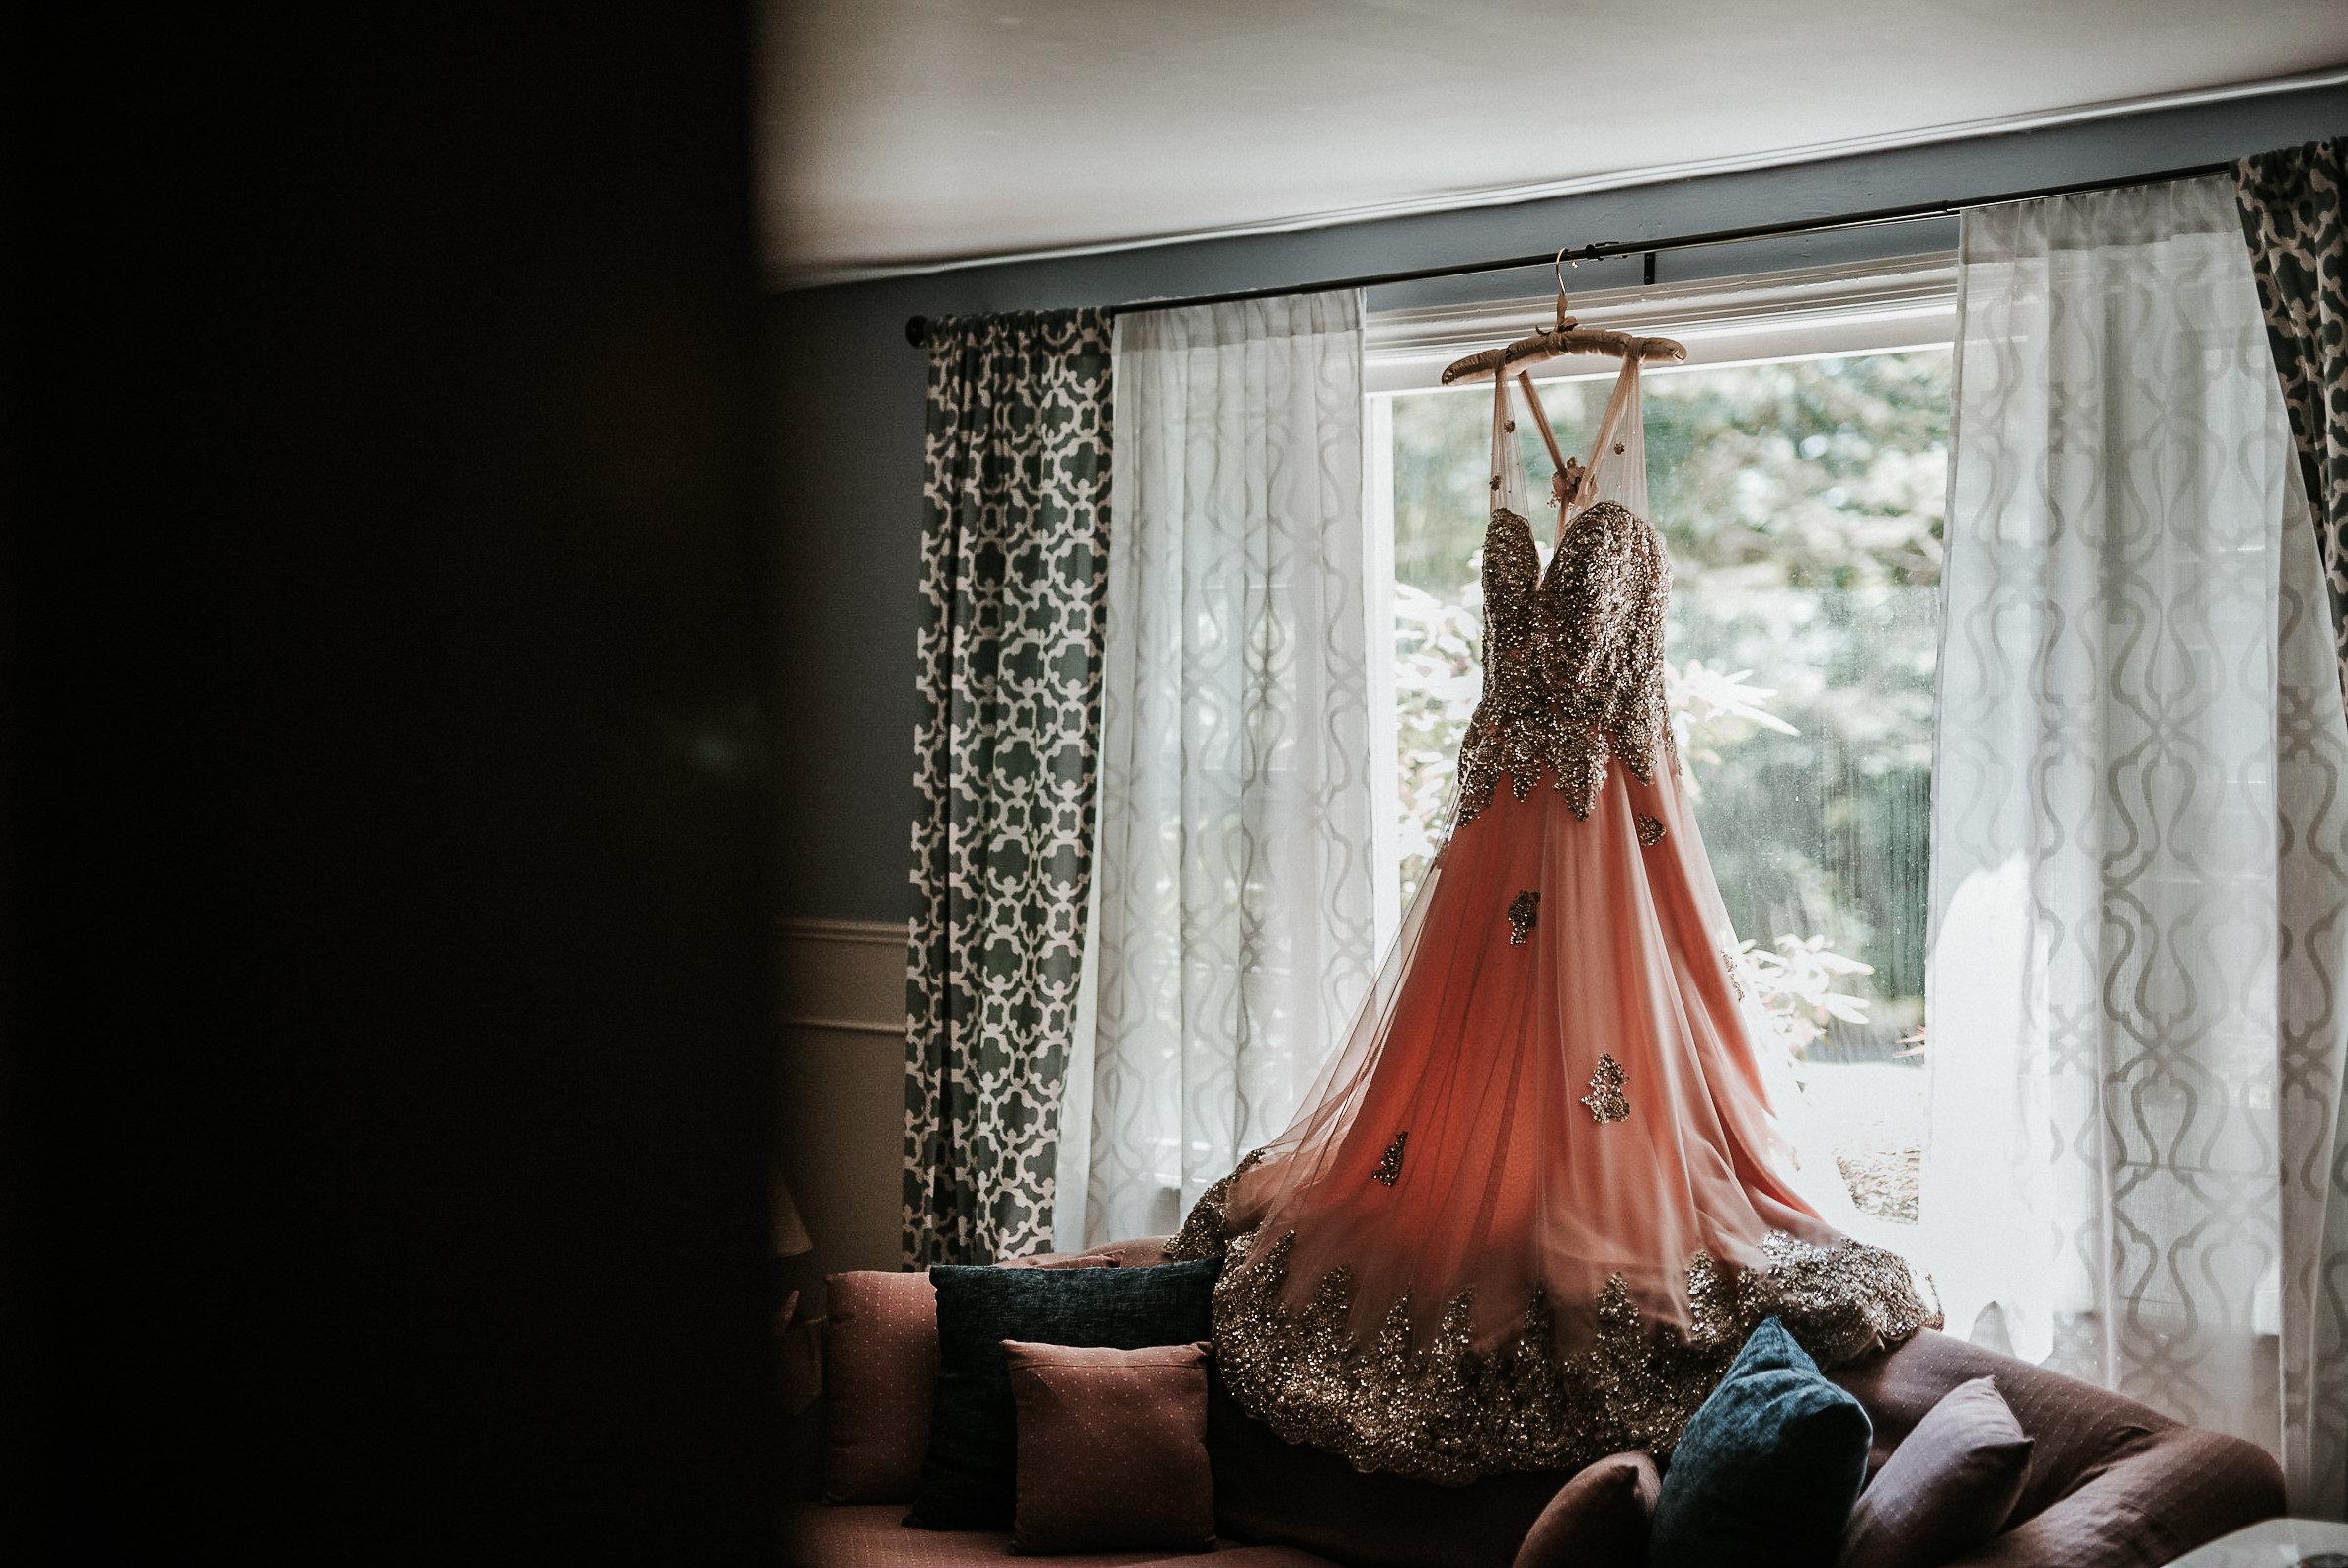 Pink wedding dress hanging in window